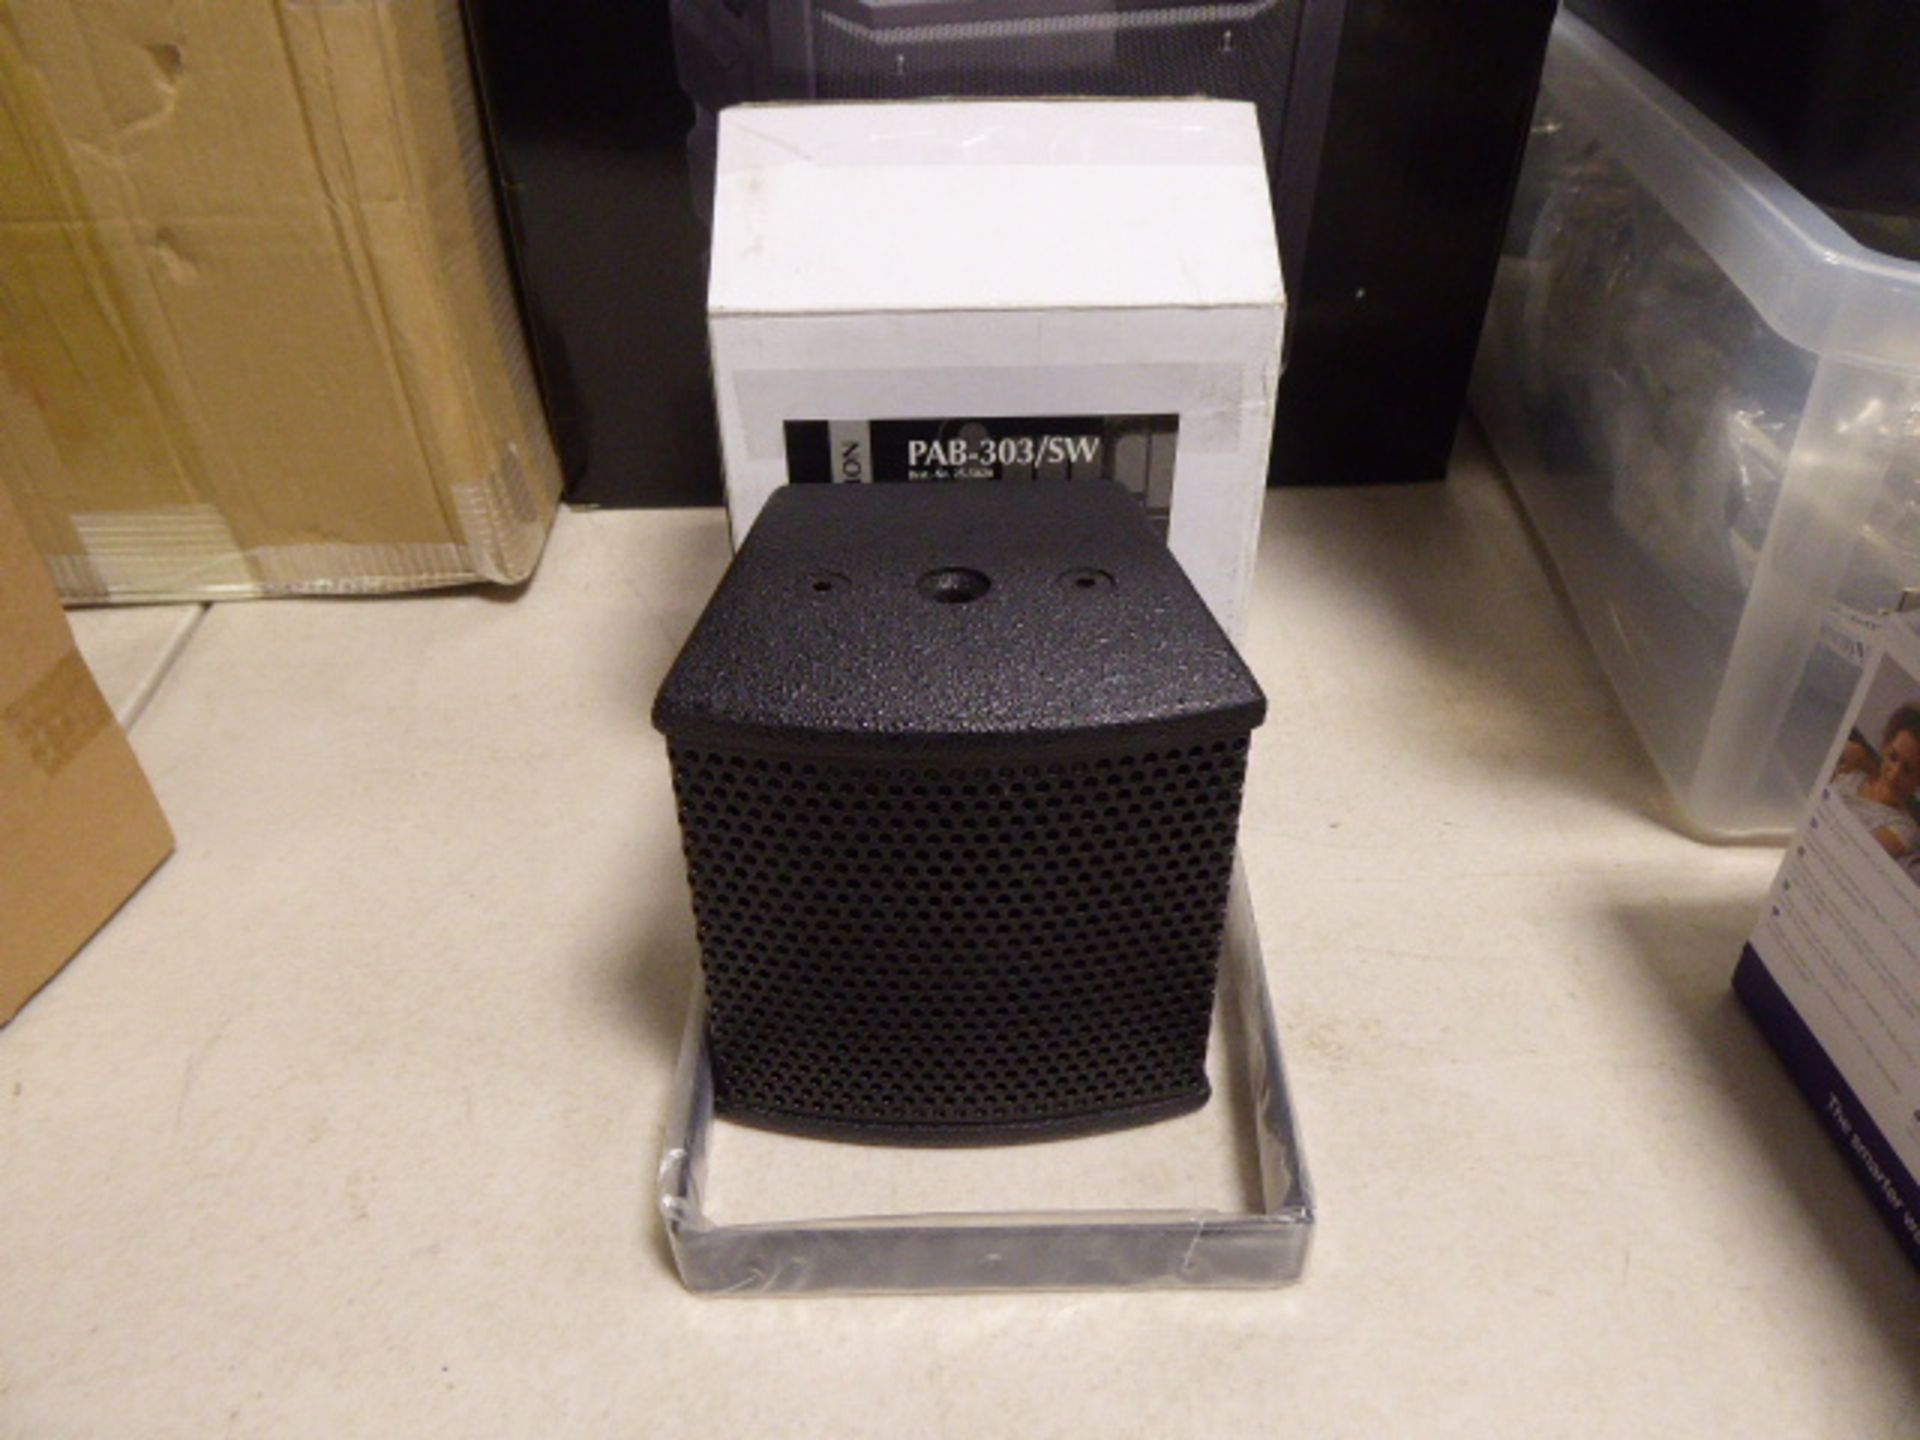 Stage Line PAD-303SW mini PA speaker system in box